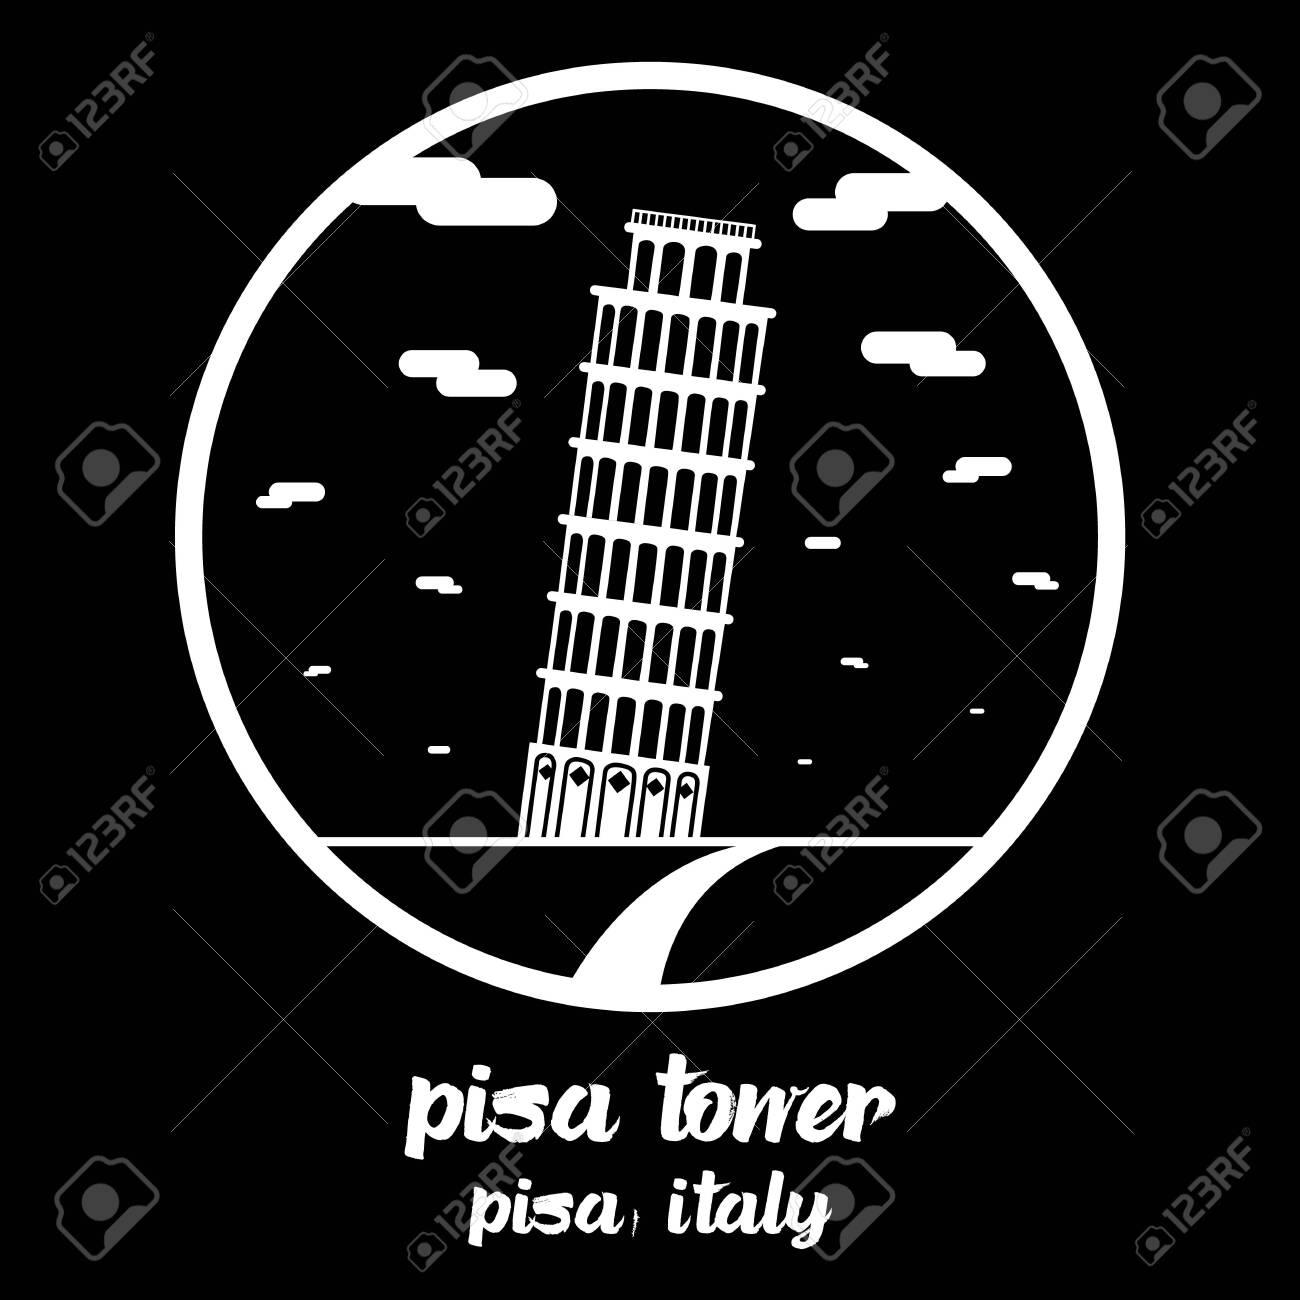 Circle icon line Pisa Tower. vector illustration - 133312992